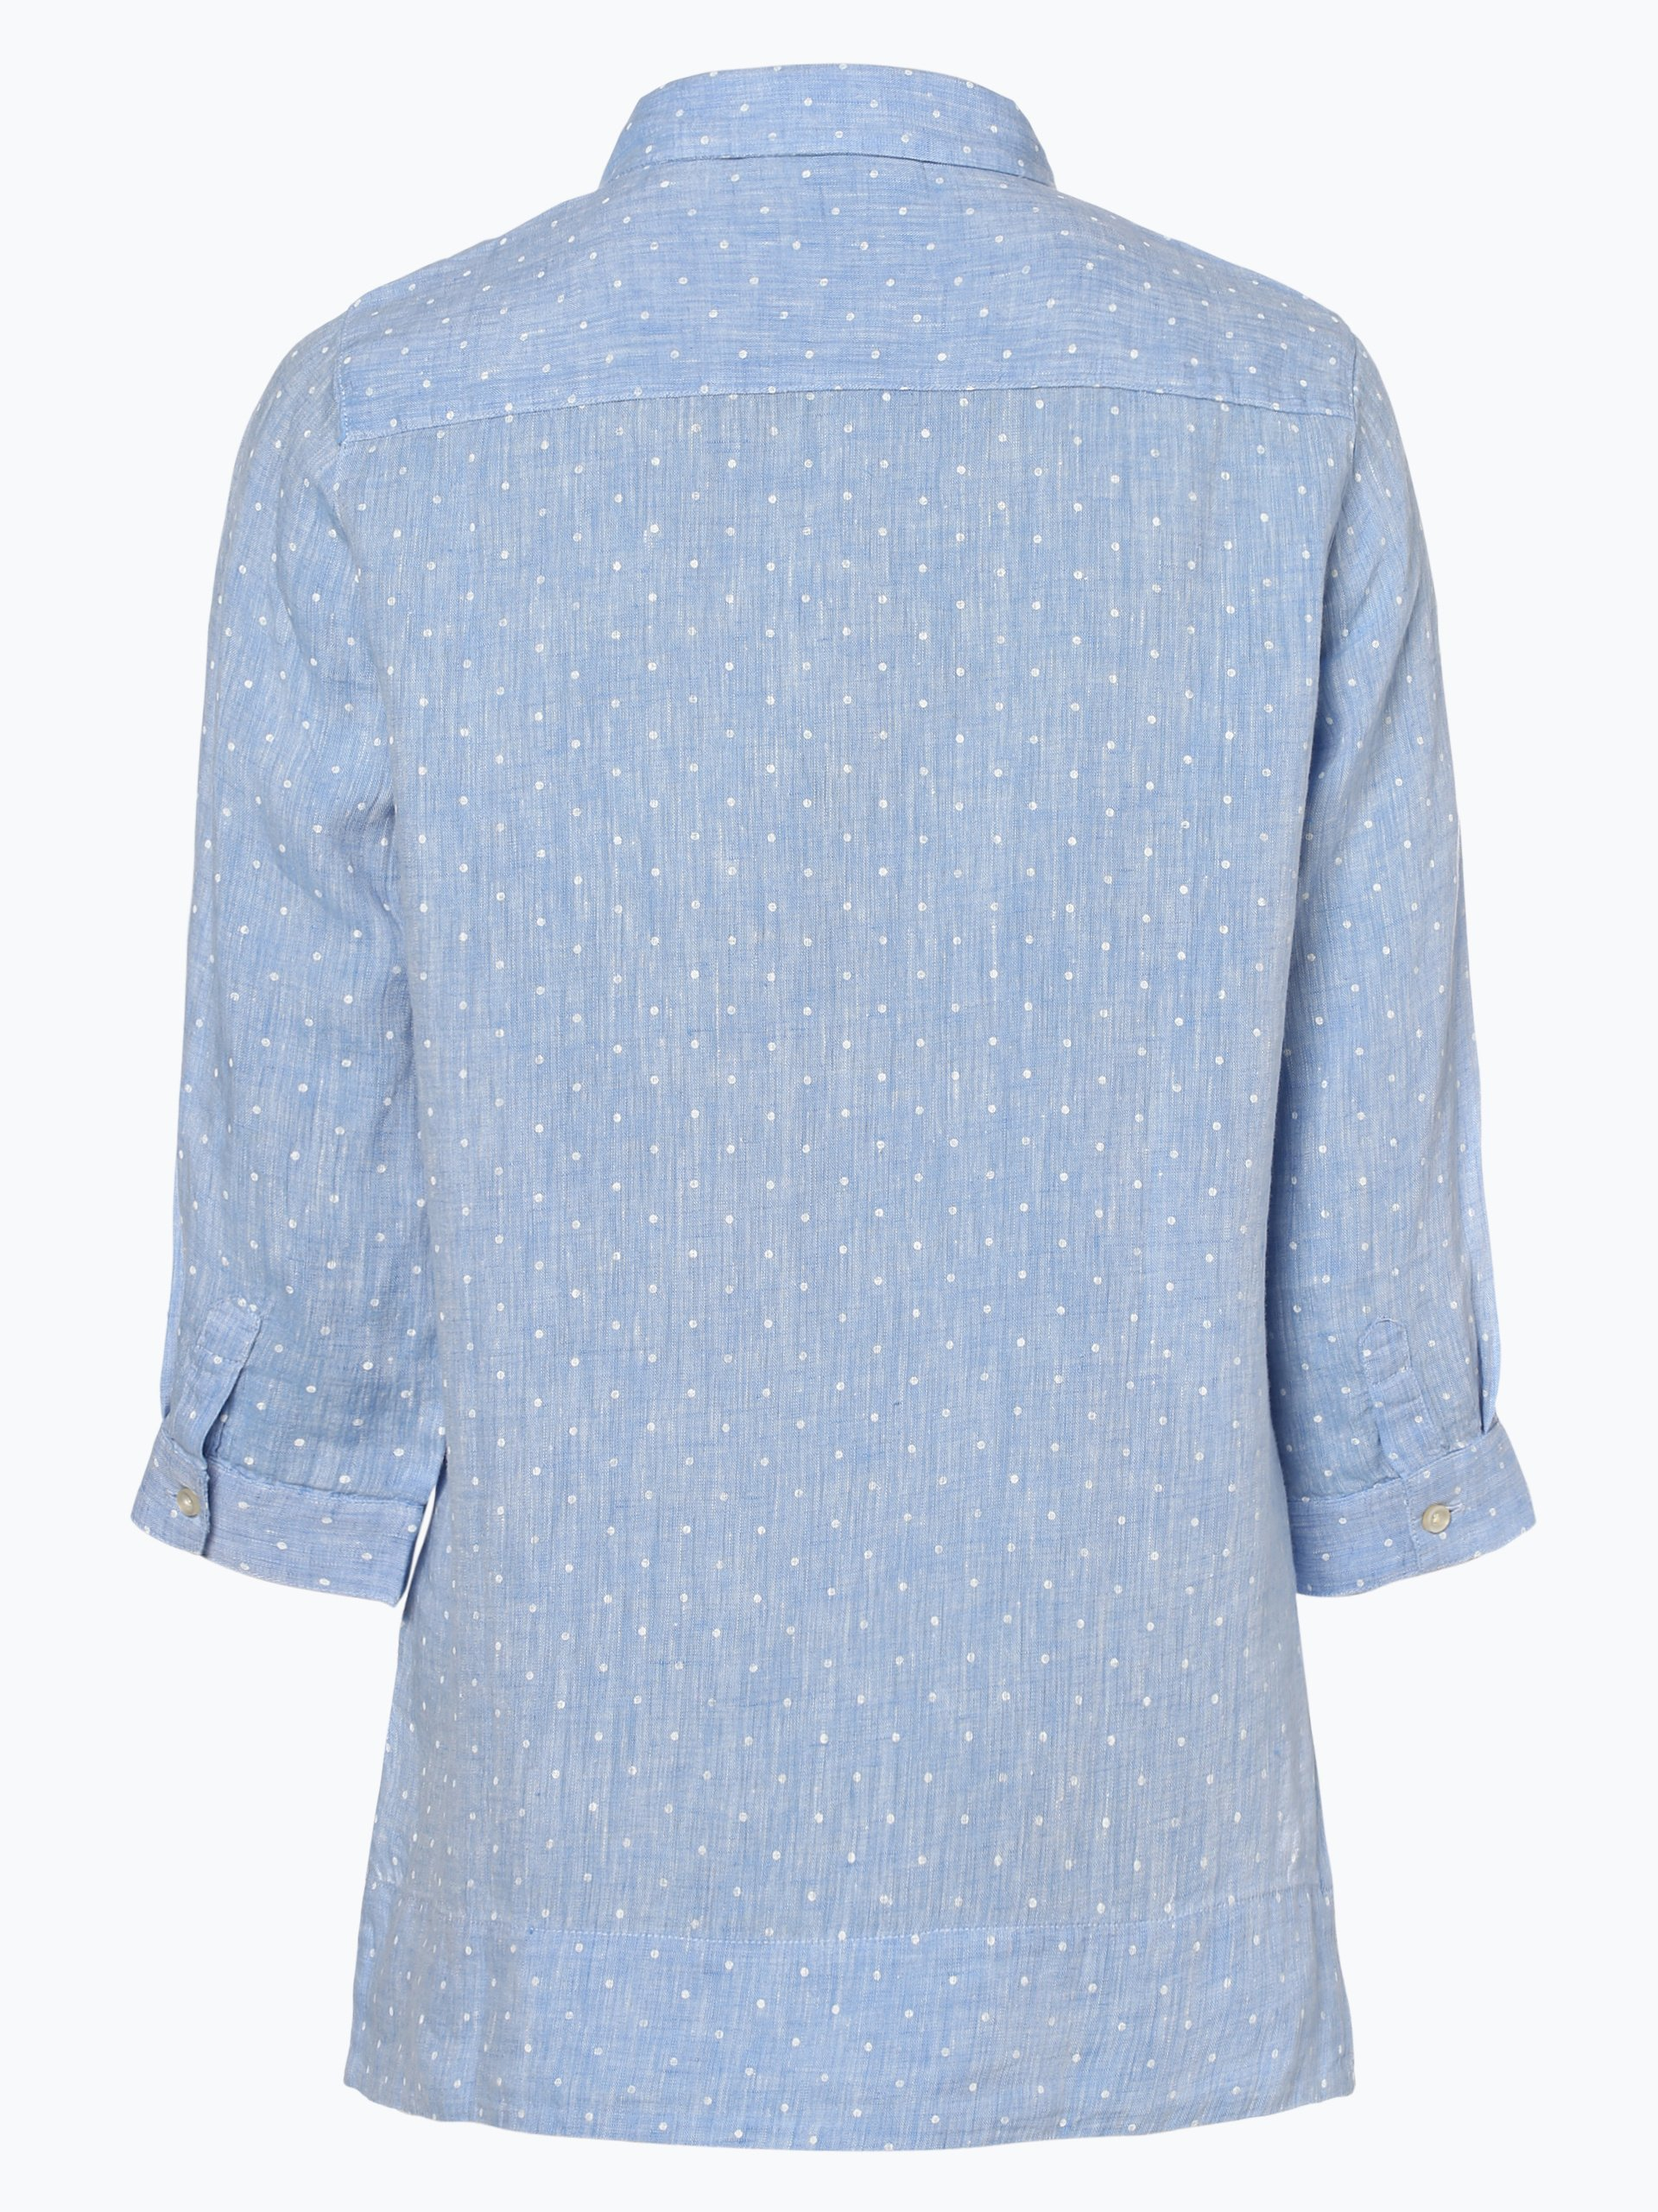 Franco Callegari Damen Bluse aus Leinen